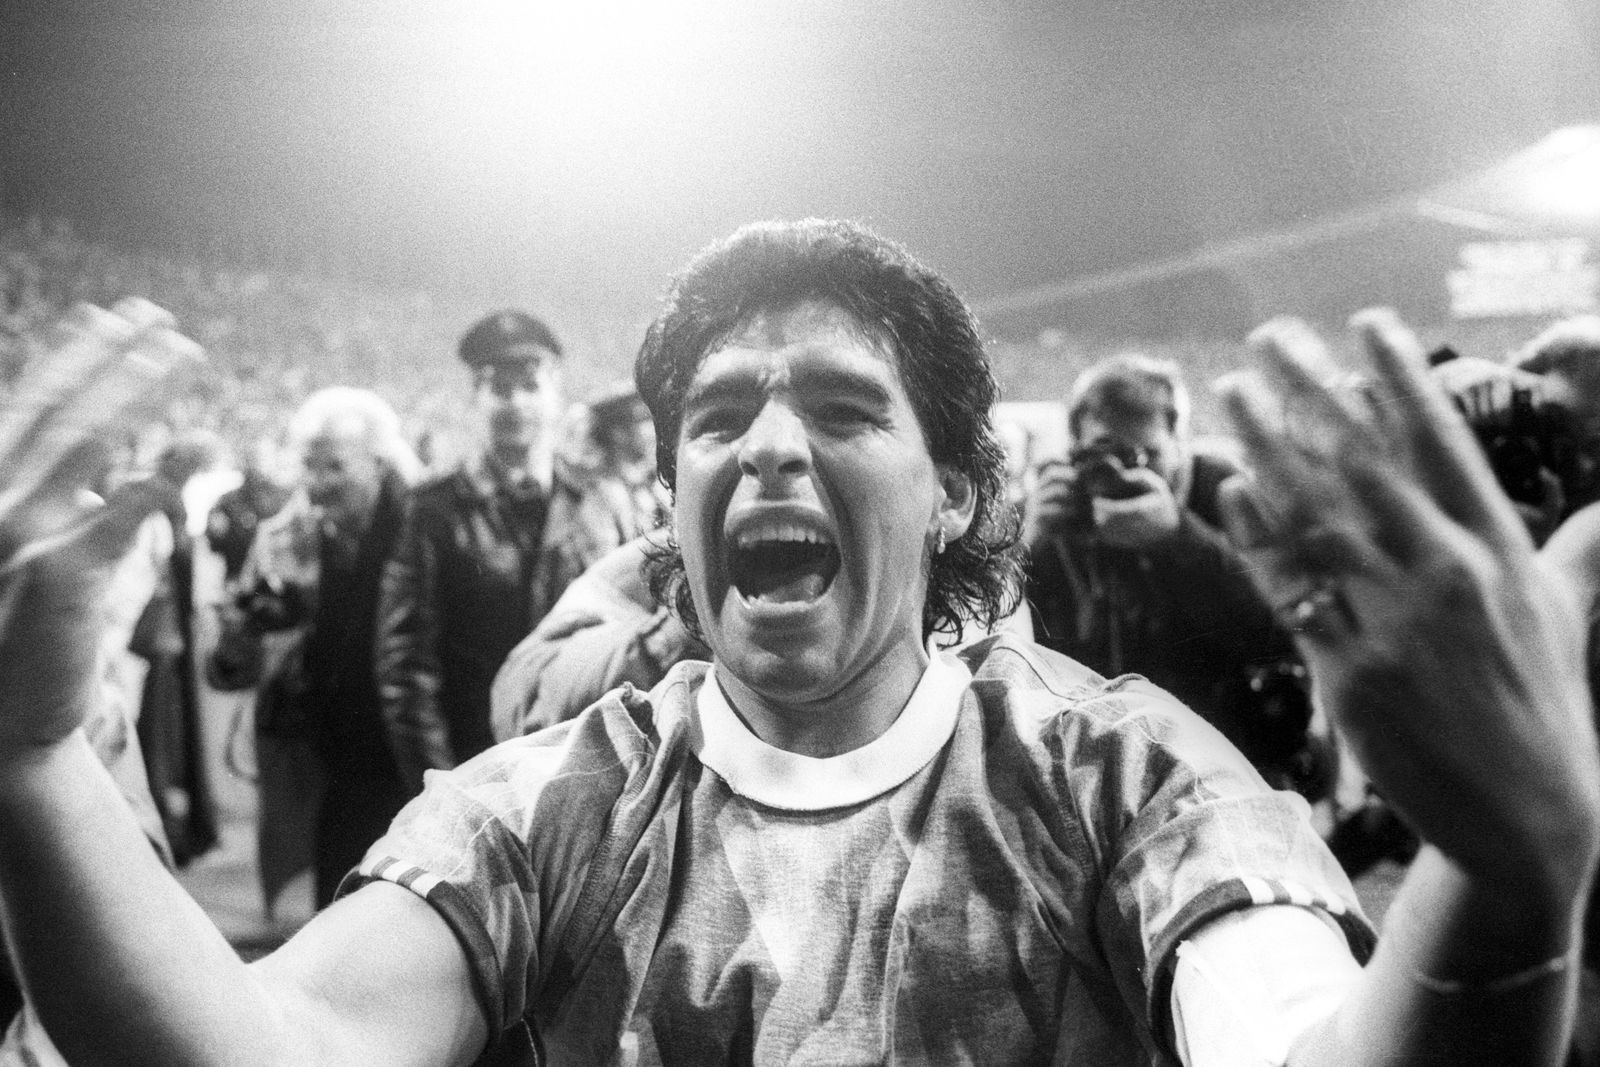 FC Bayern München - SSC Neapel 2:2 - Jubel von Diego Armando Maradona (Neapel)